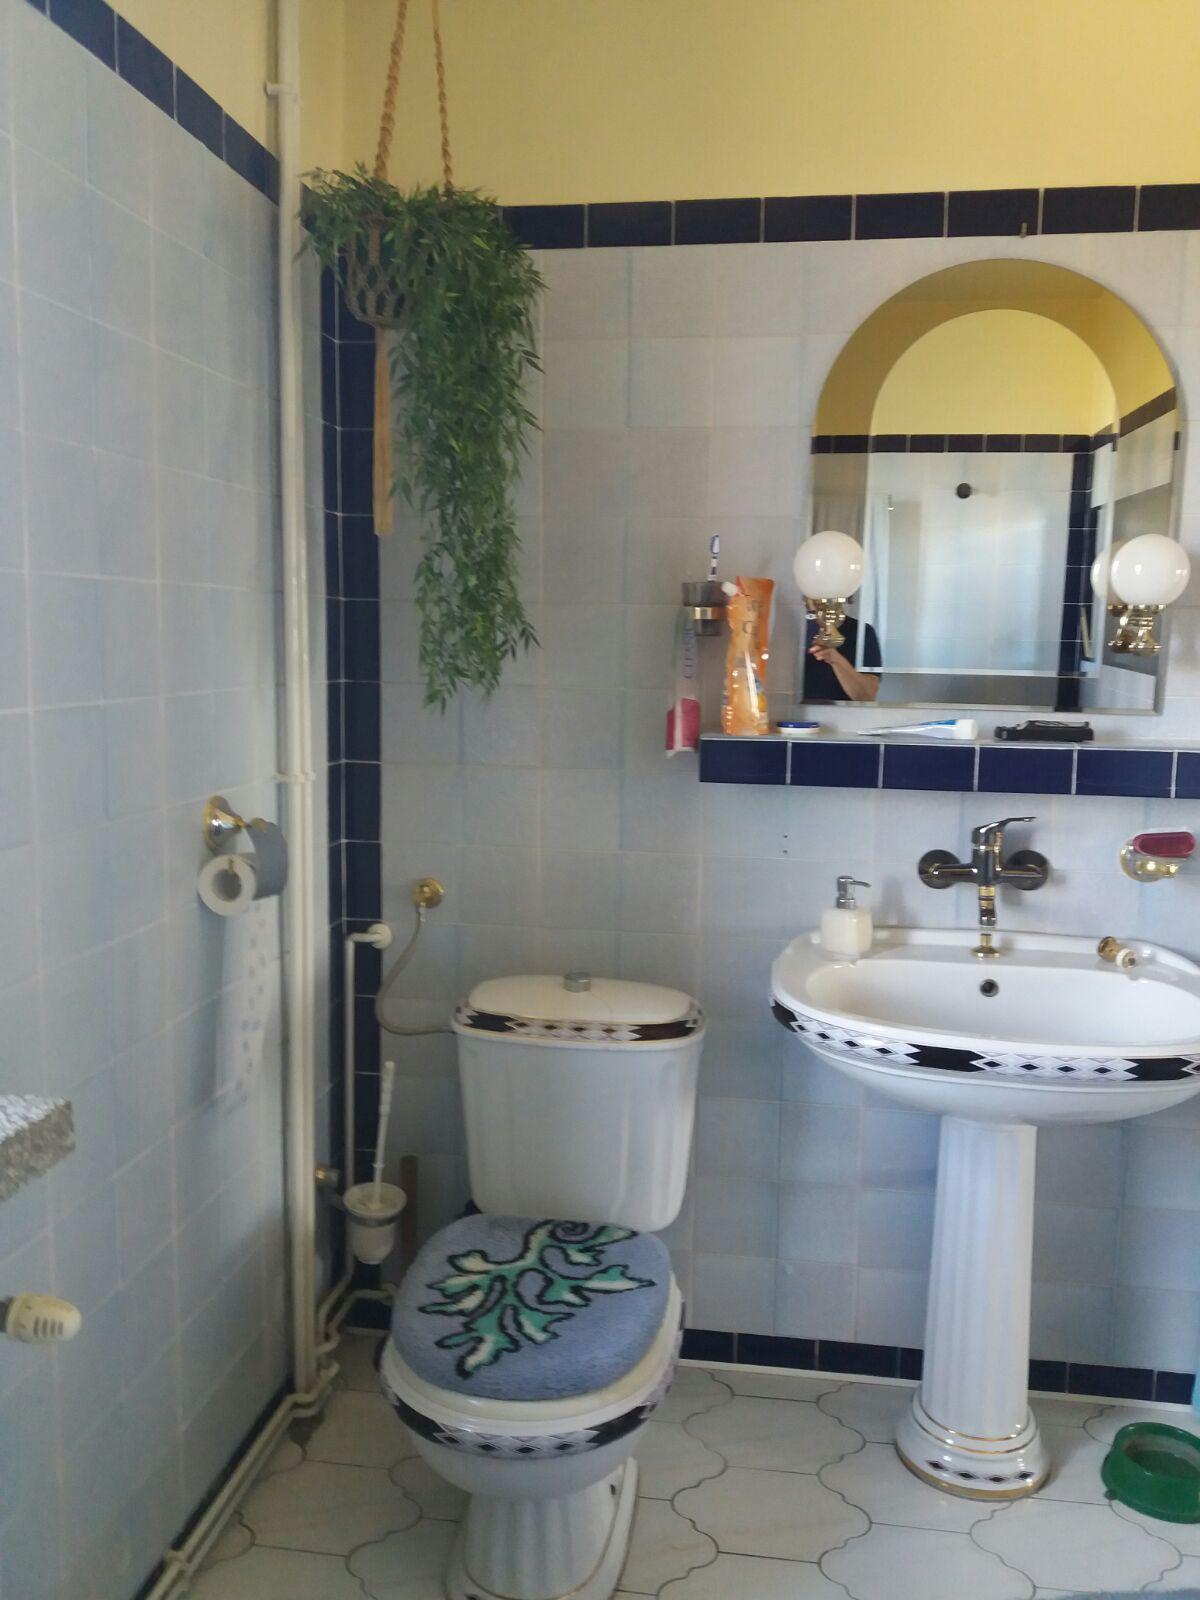 Farby Blecharski Metamorfoza łazienki Przy Użyciu Farb V33